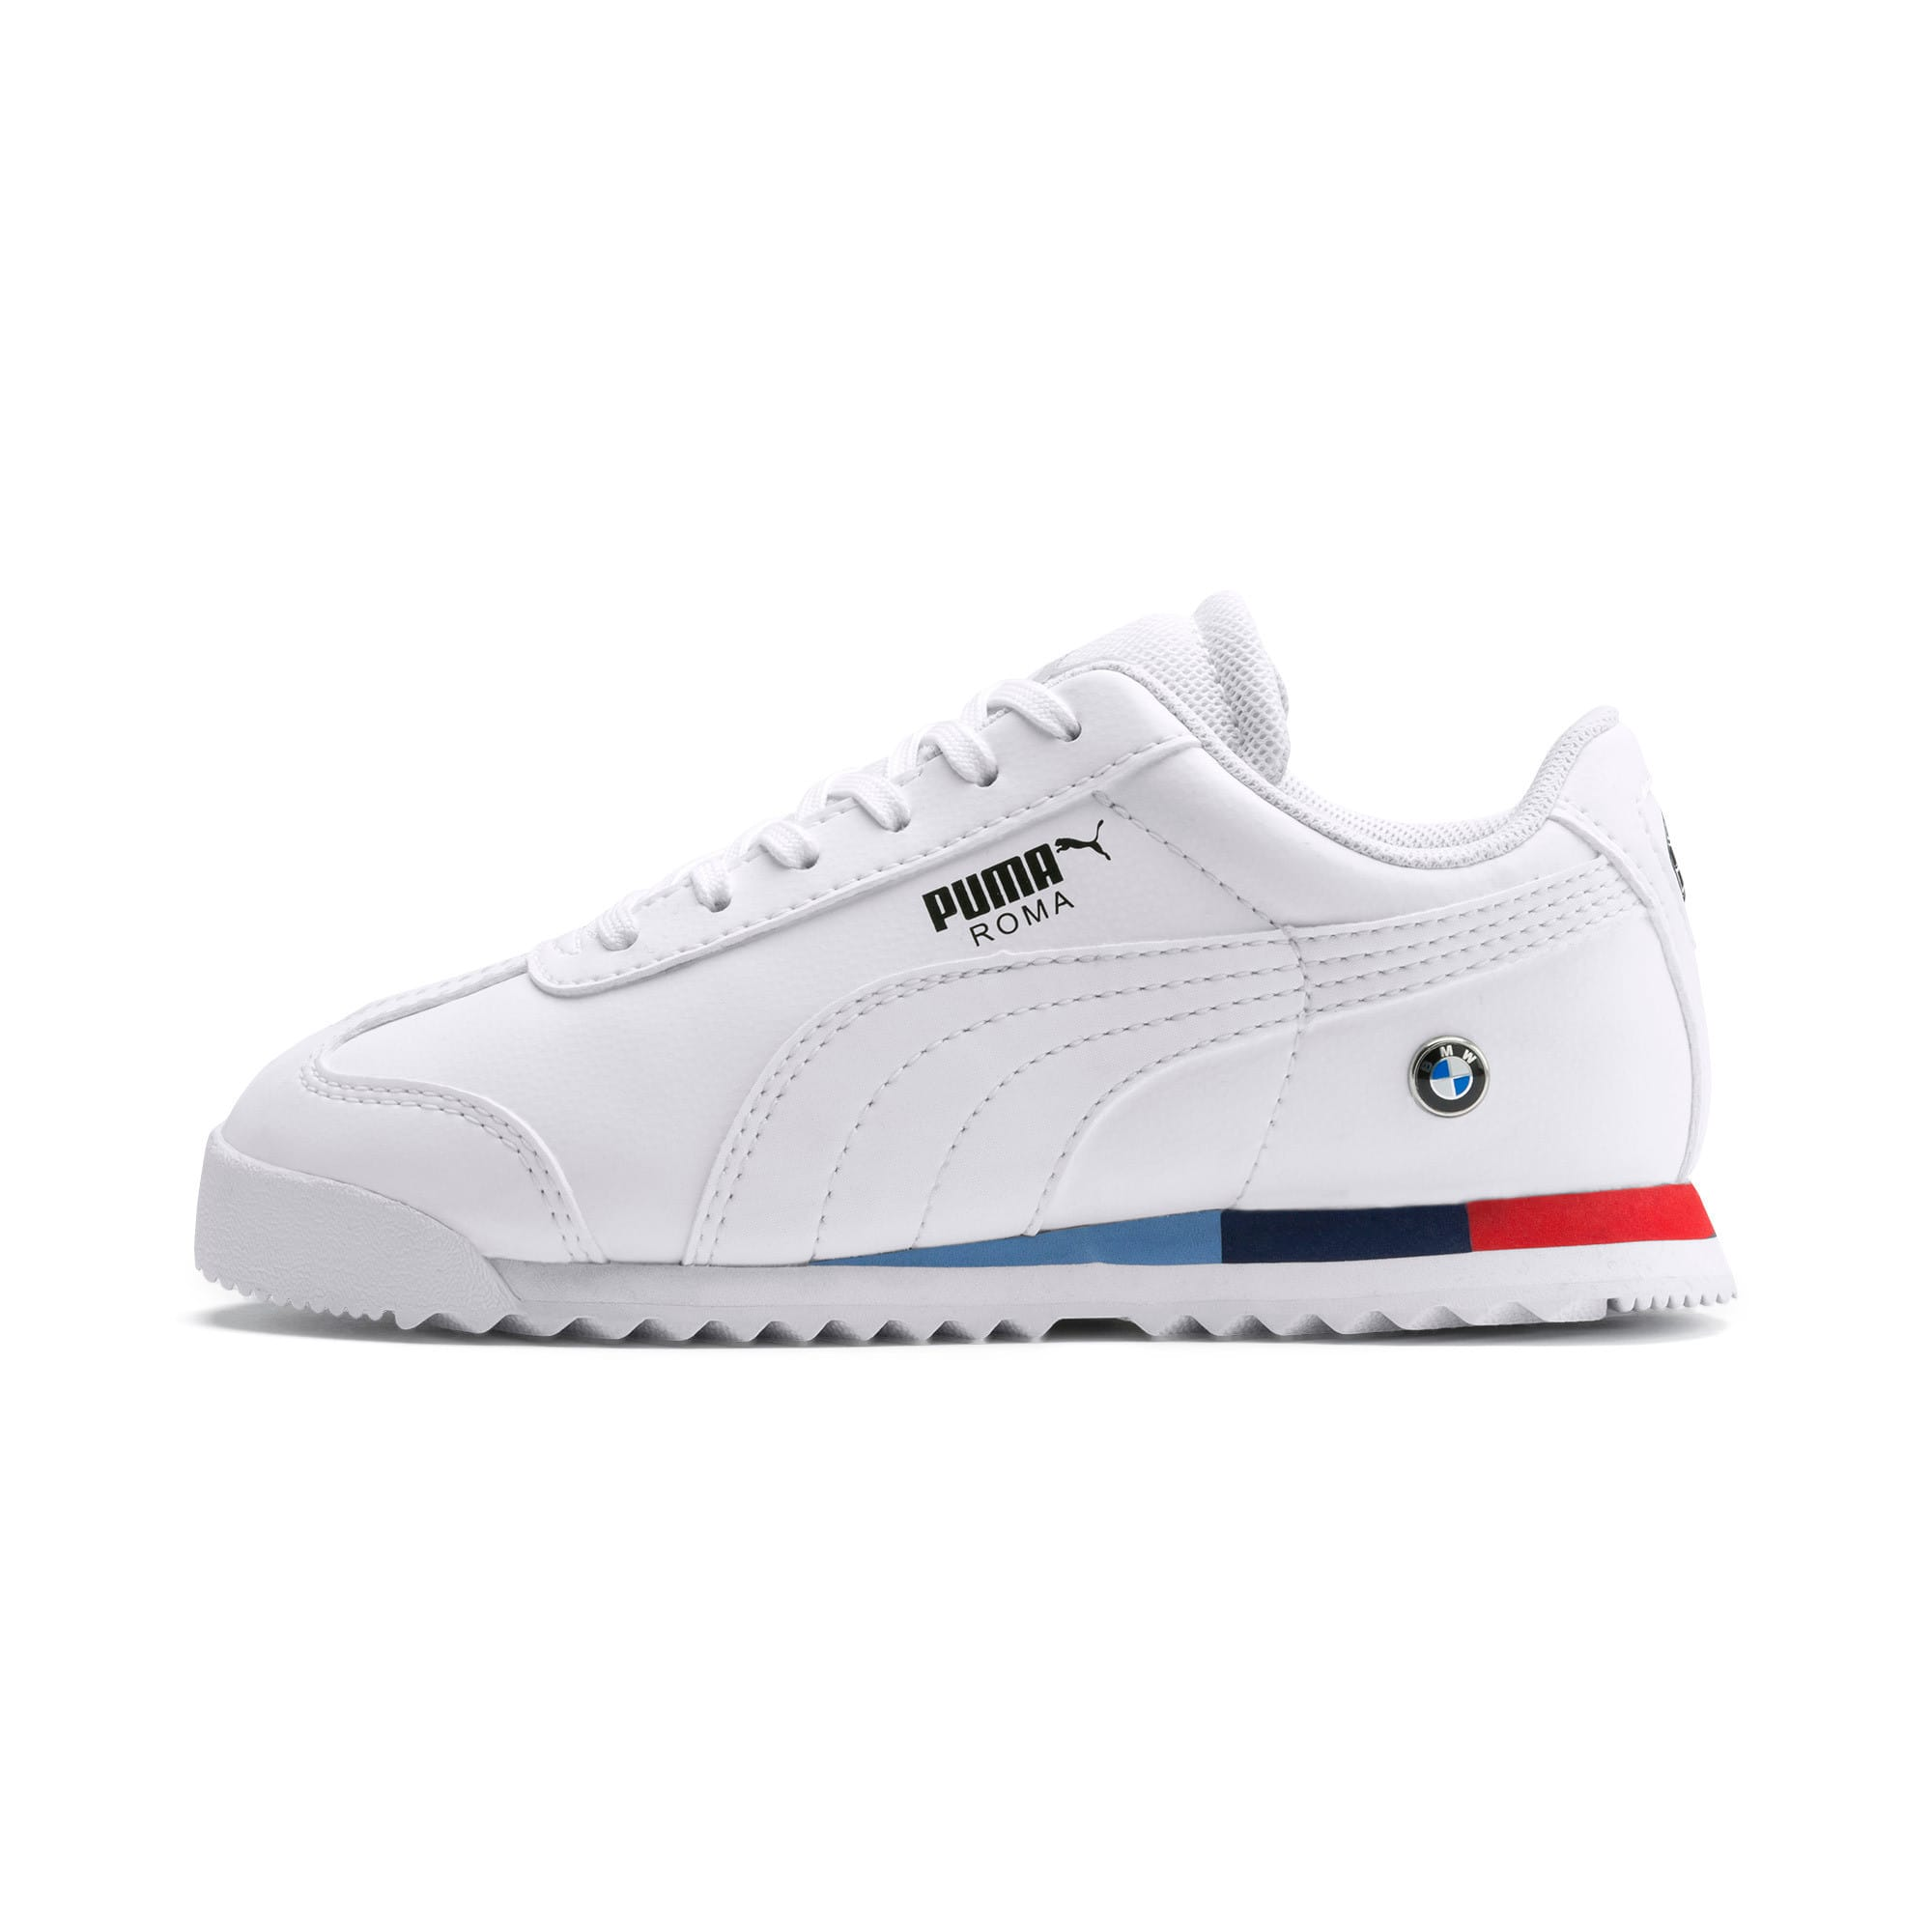 Thumbnail 1 of BMW M Motorsport Roma Little Kids' Shoes, Puma White-Puma White, medium